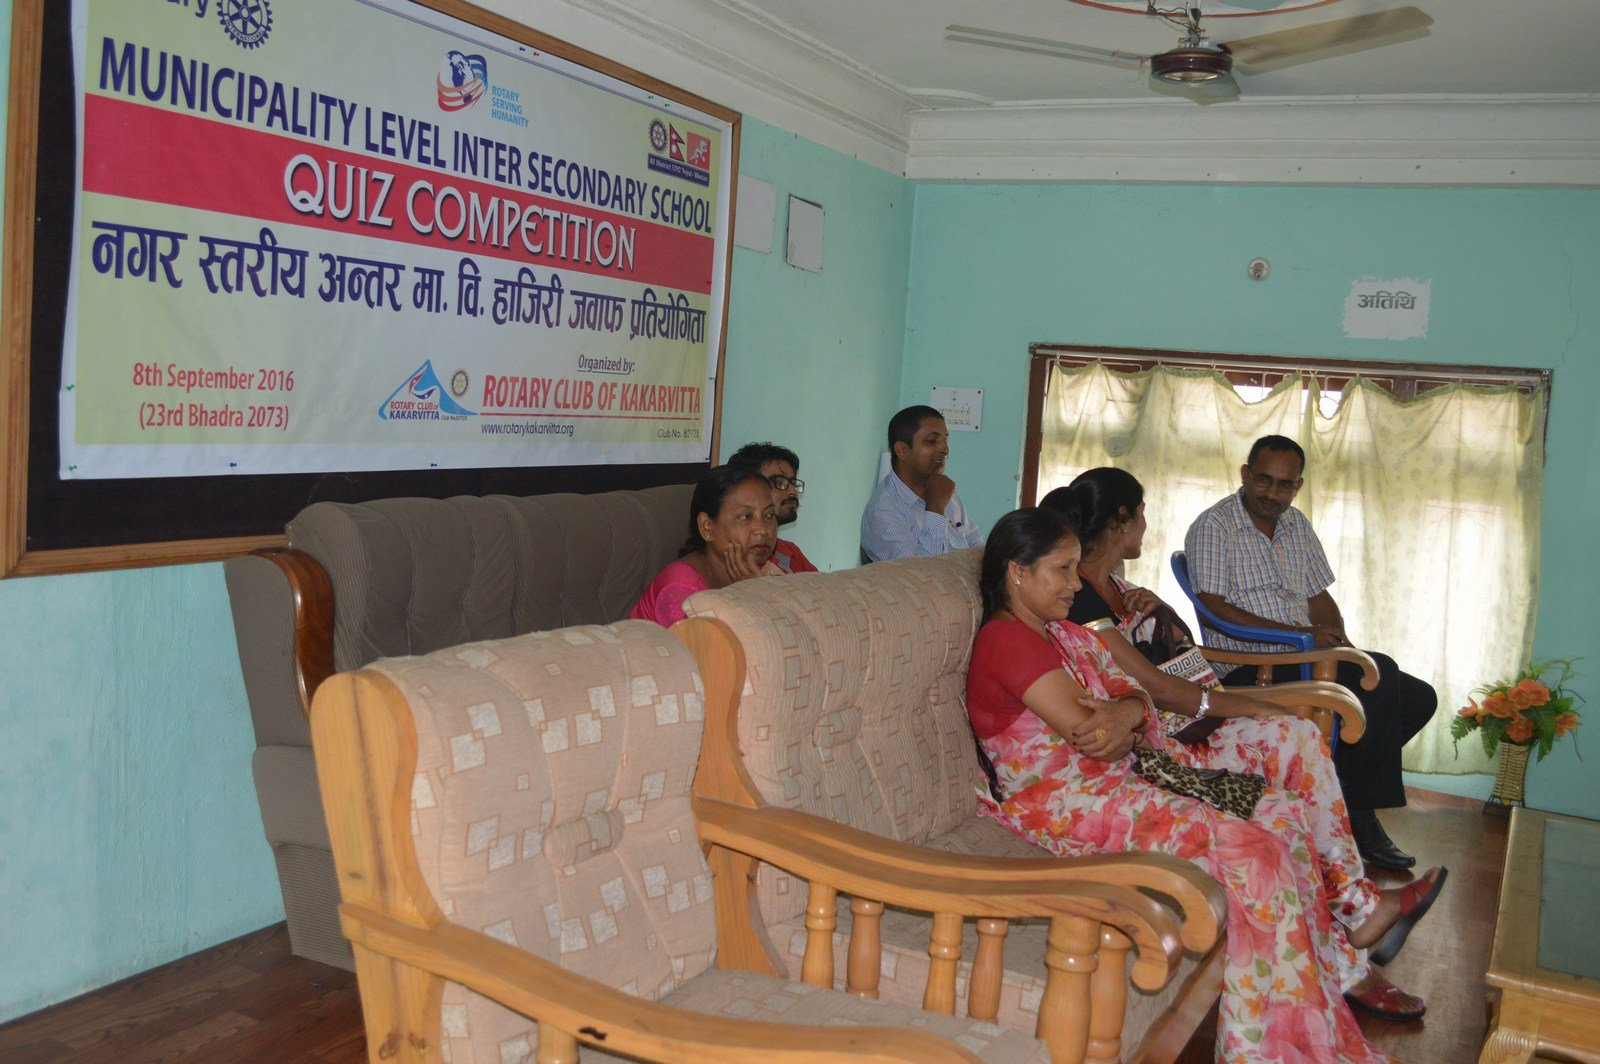 Municipality-Level-Inter-Secondary-School-Quiz-Contest-2016-Rotary-Club-of-Kakarvitta-25